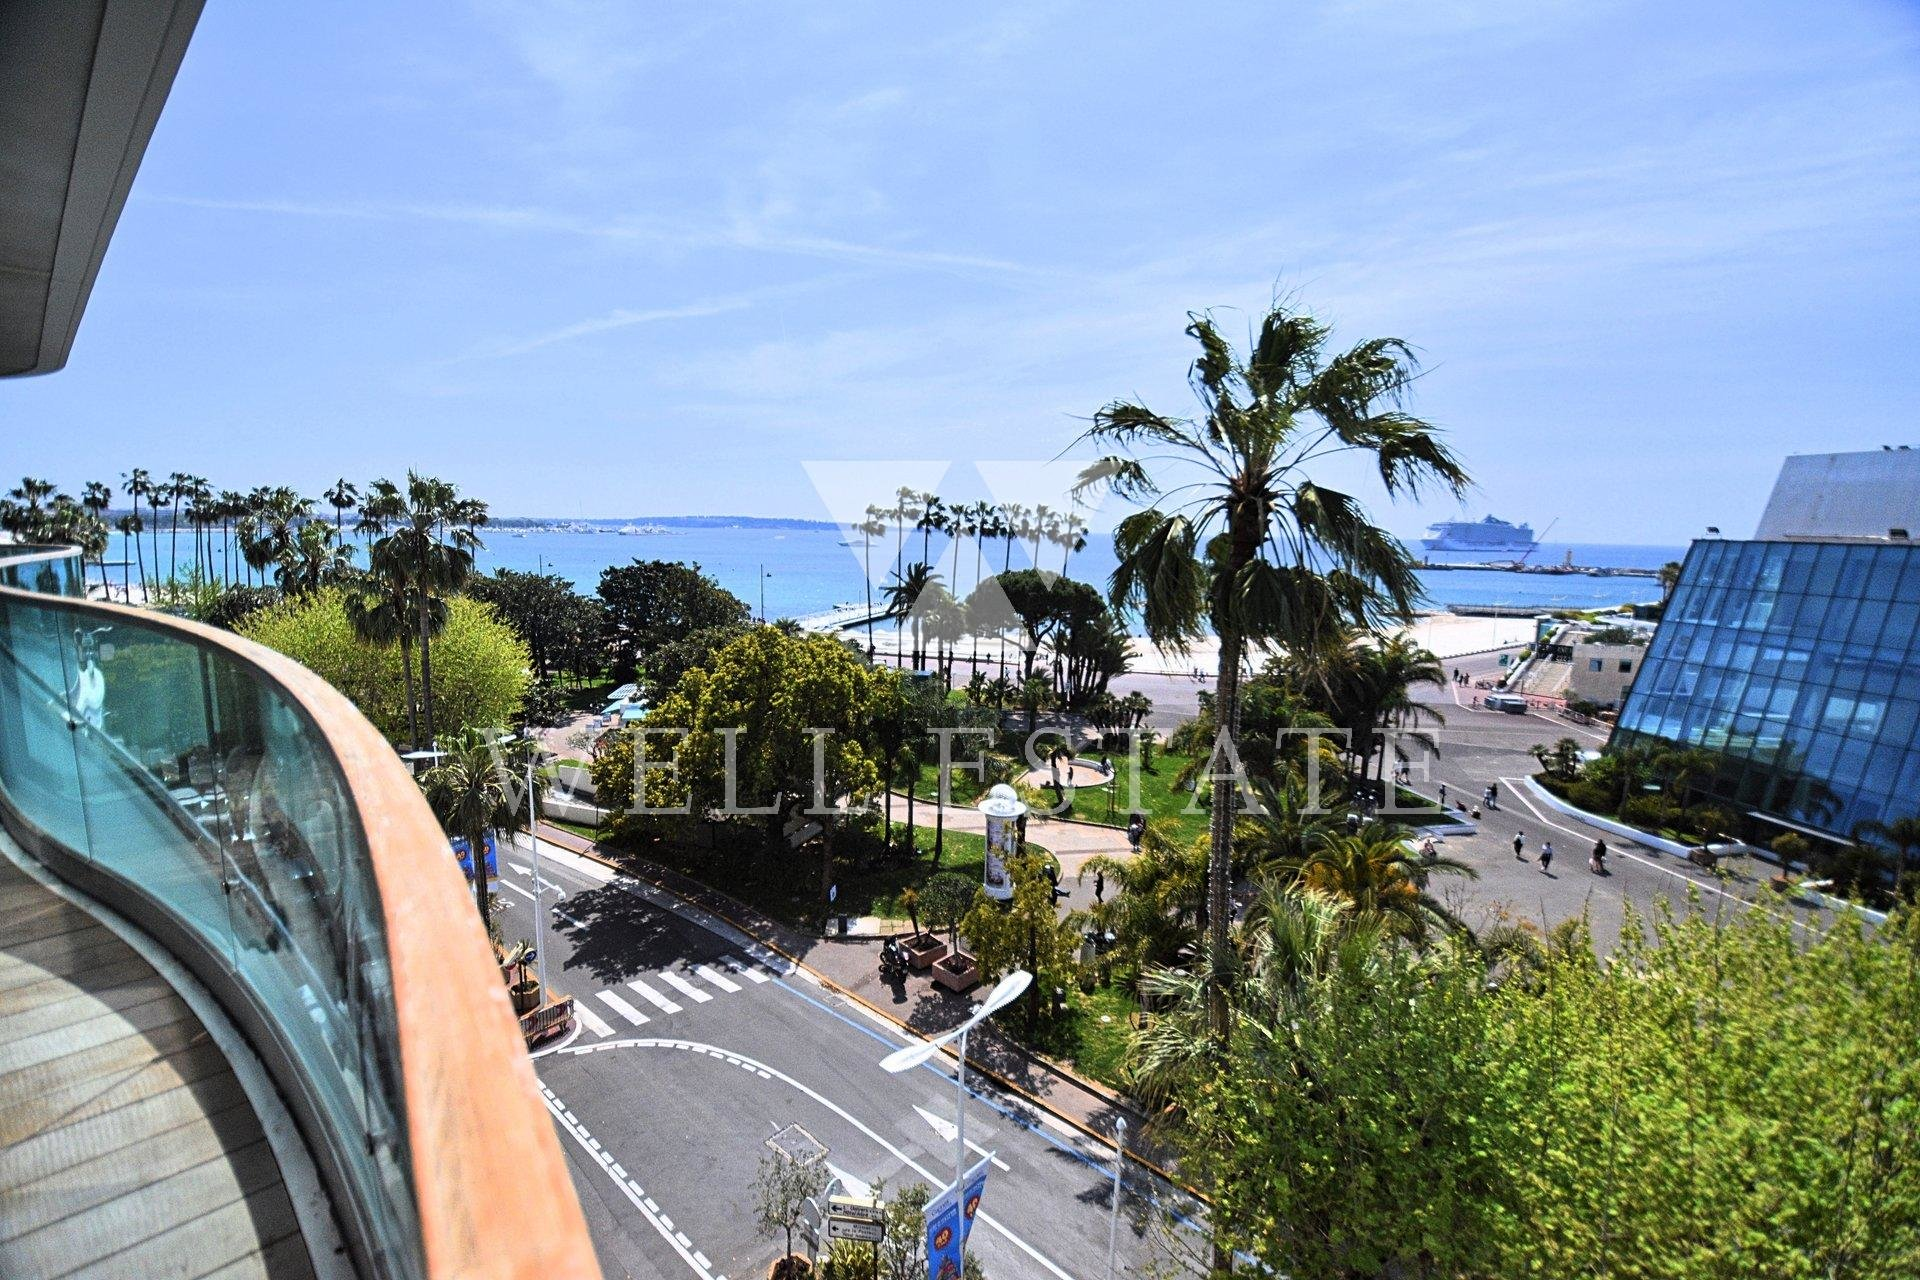 季节性出租 公寓 - 戛納 (Cannes) Croisette